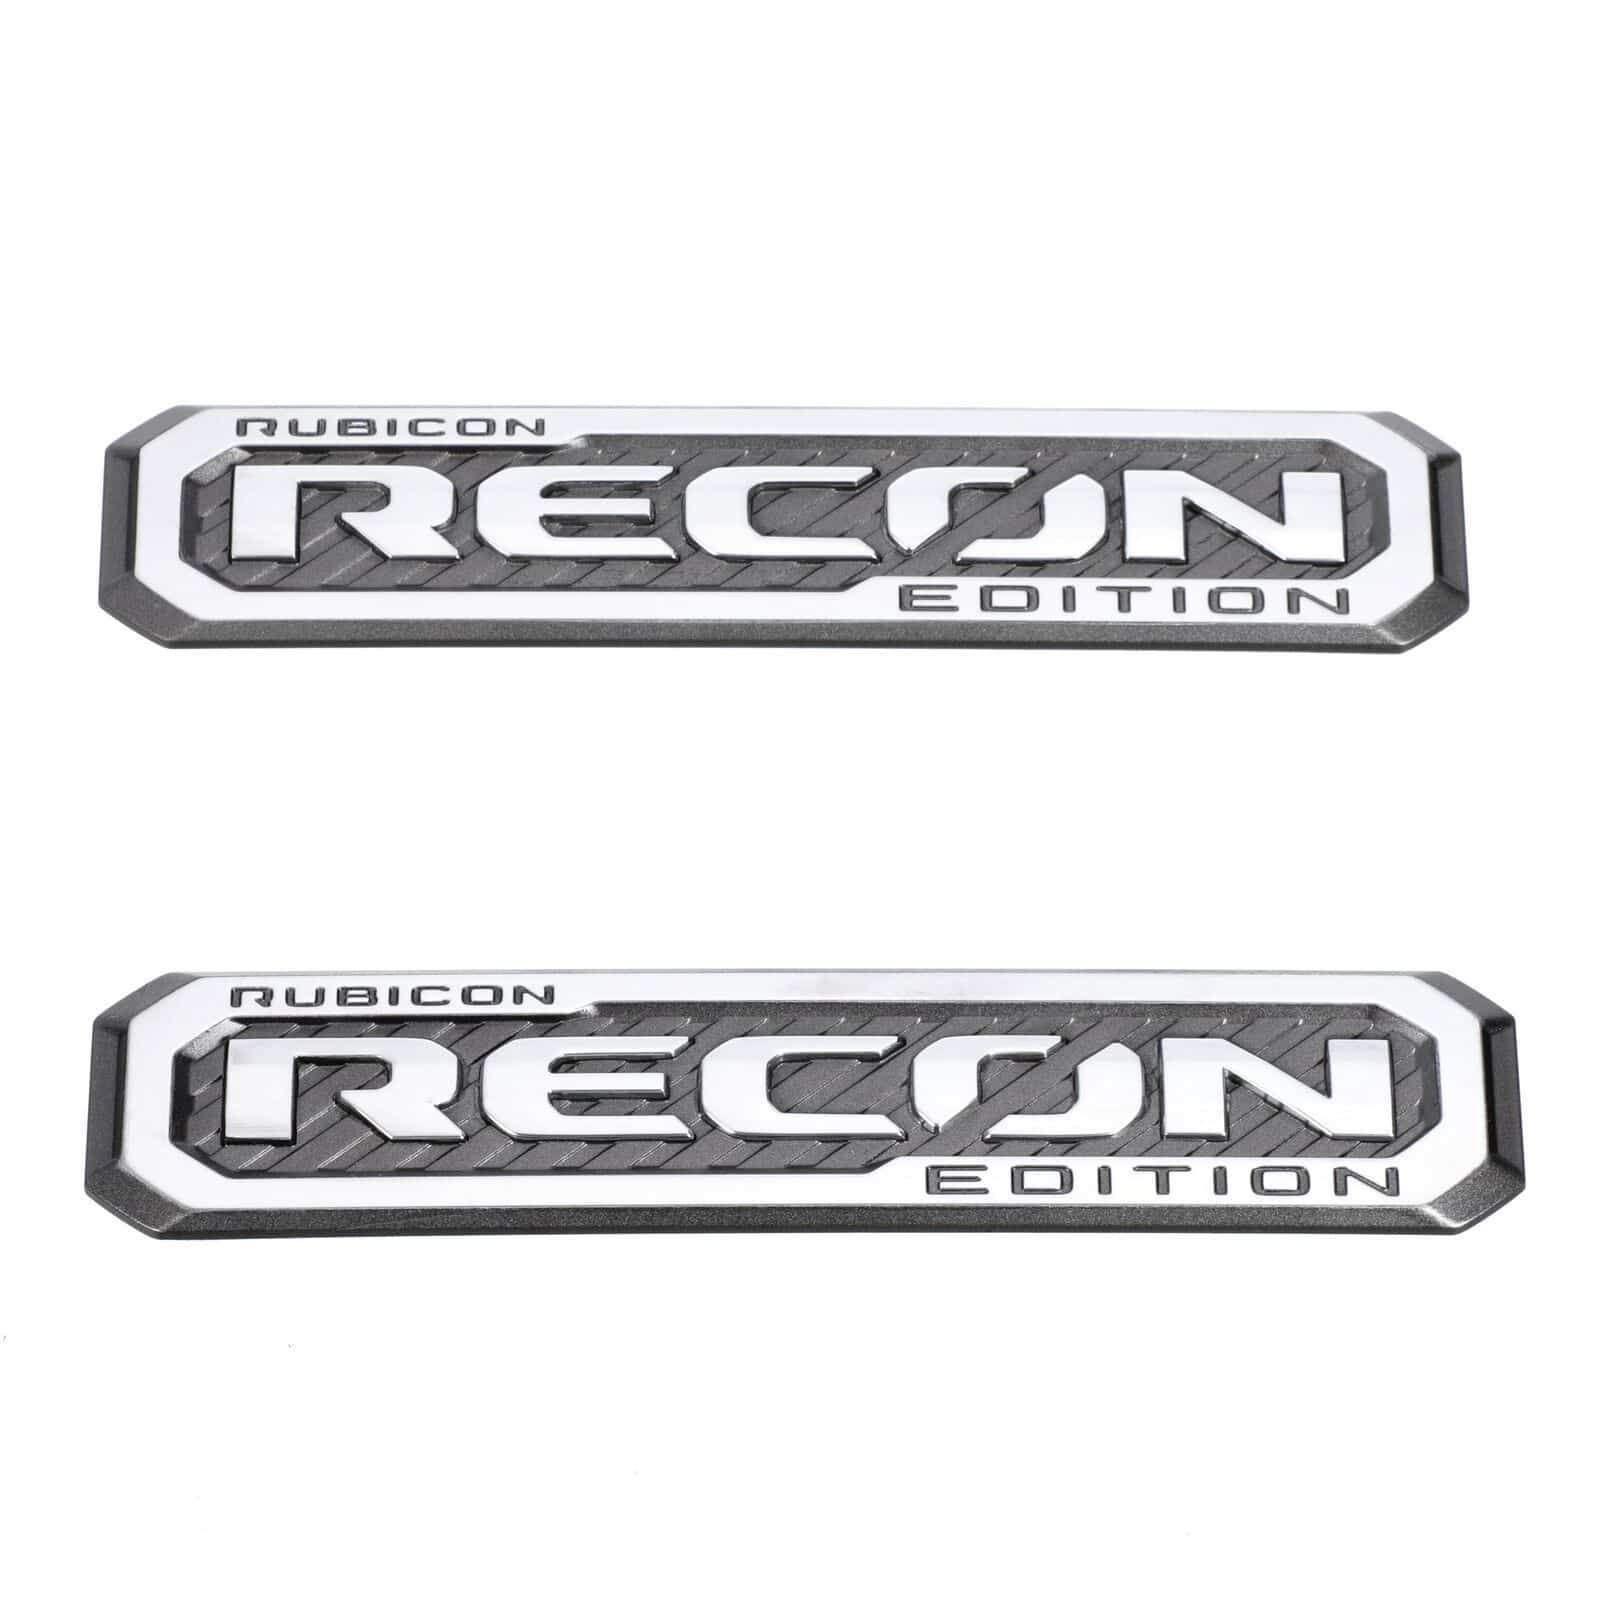 2017 2018 Jeep Wrangler 2 Rubicon Recon Emblem Badge Nameplate